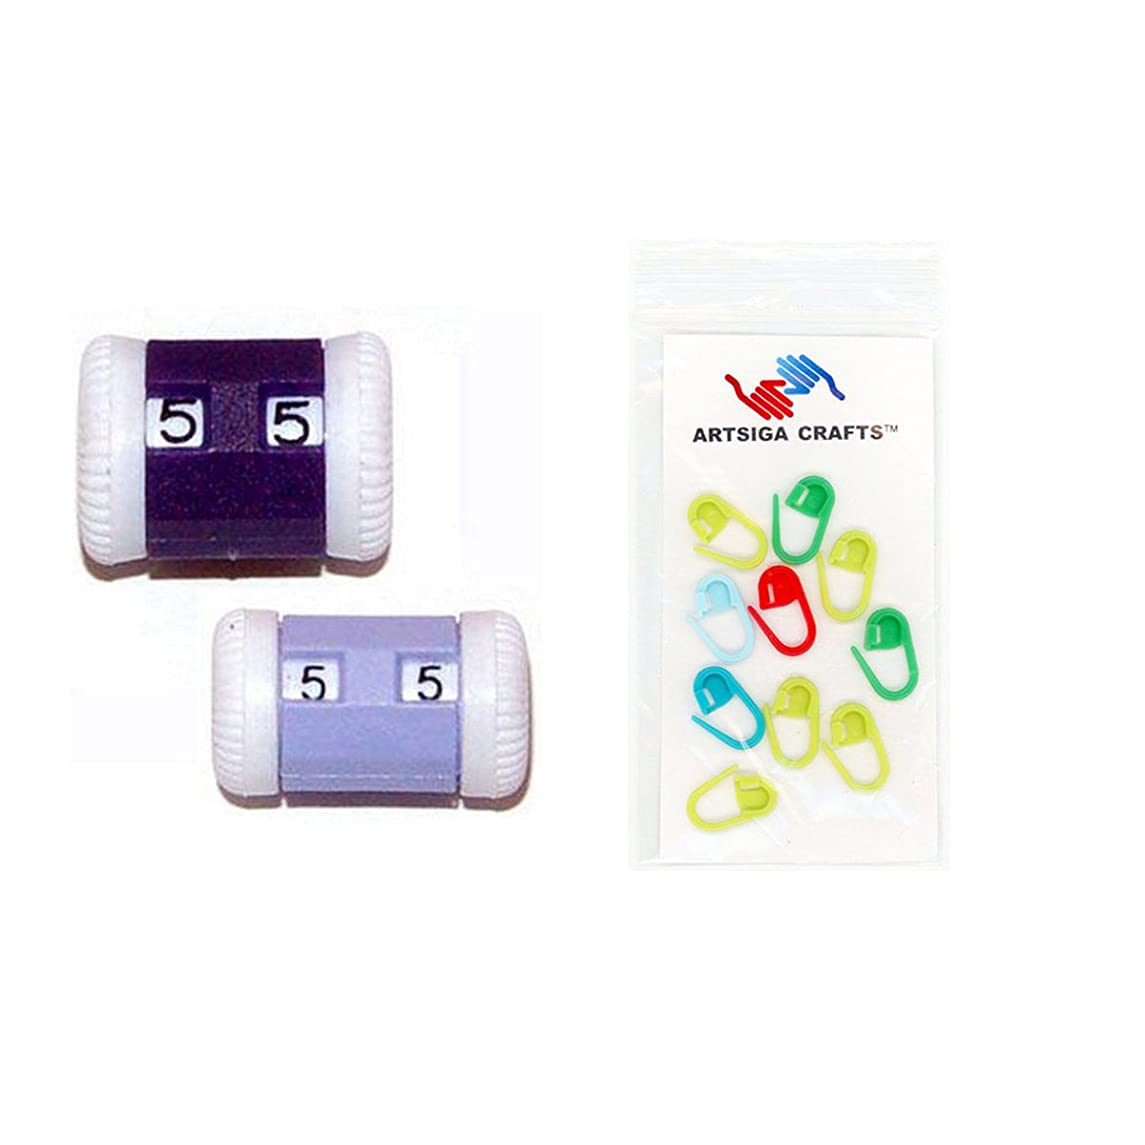 addi Rotally Row Counter Set of 2 Bundle with 10 Artsiga Crafts Stitch Markers